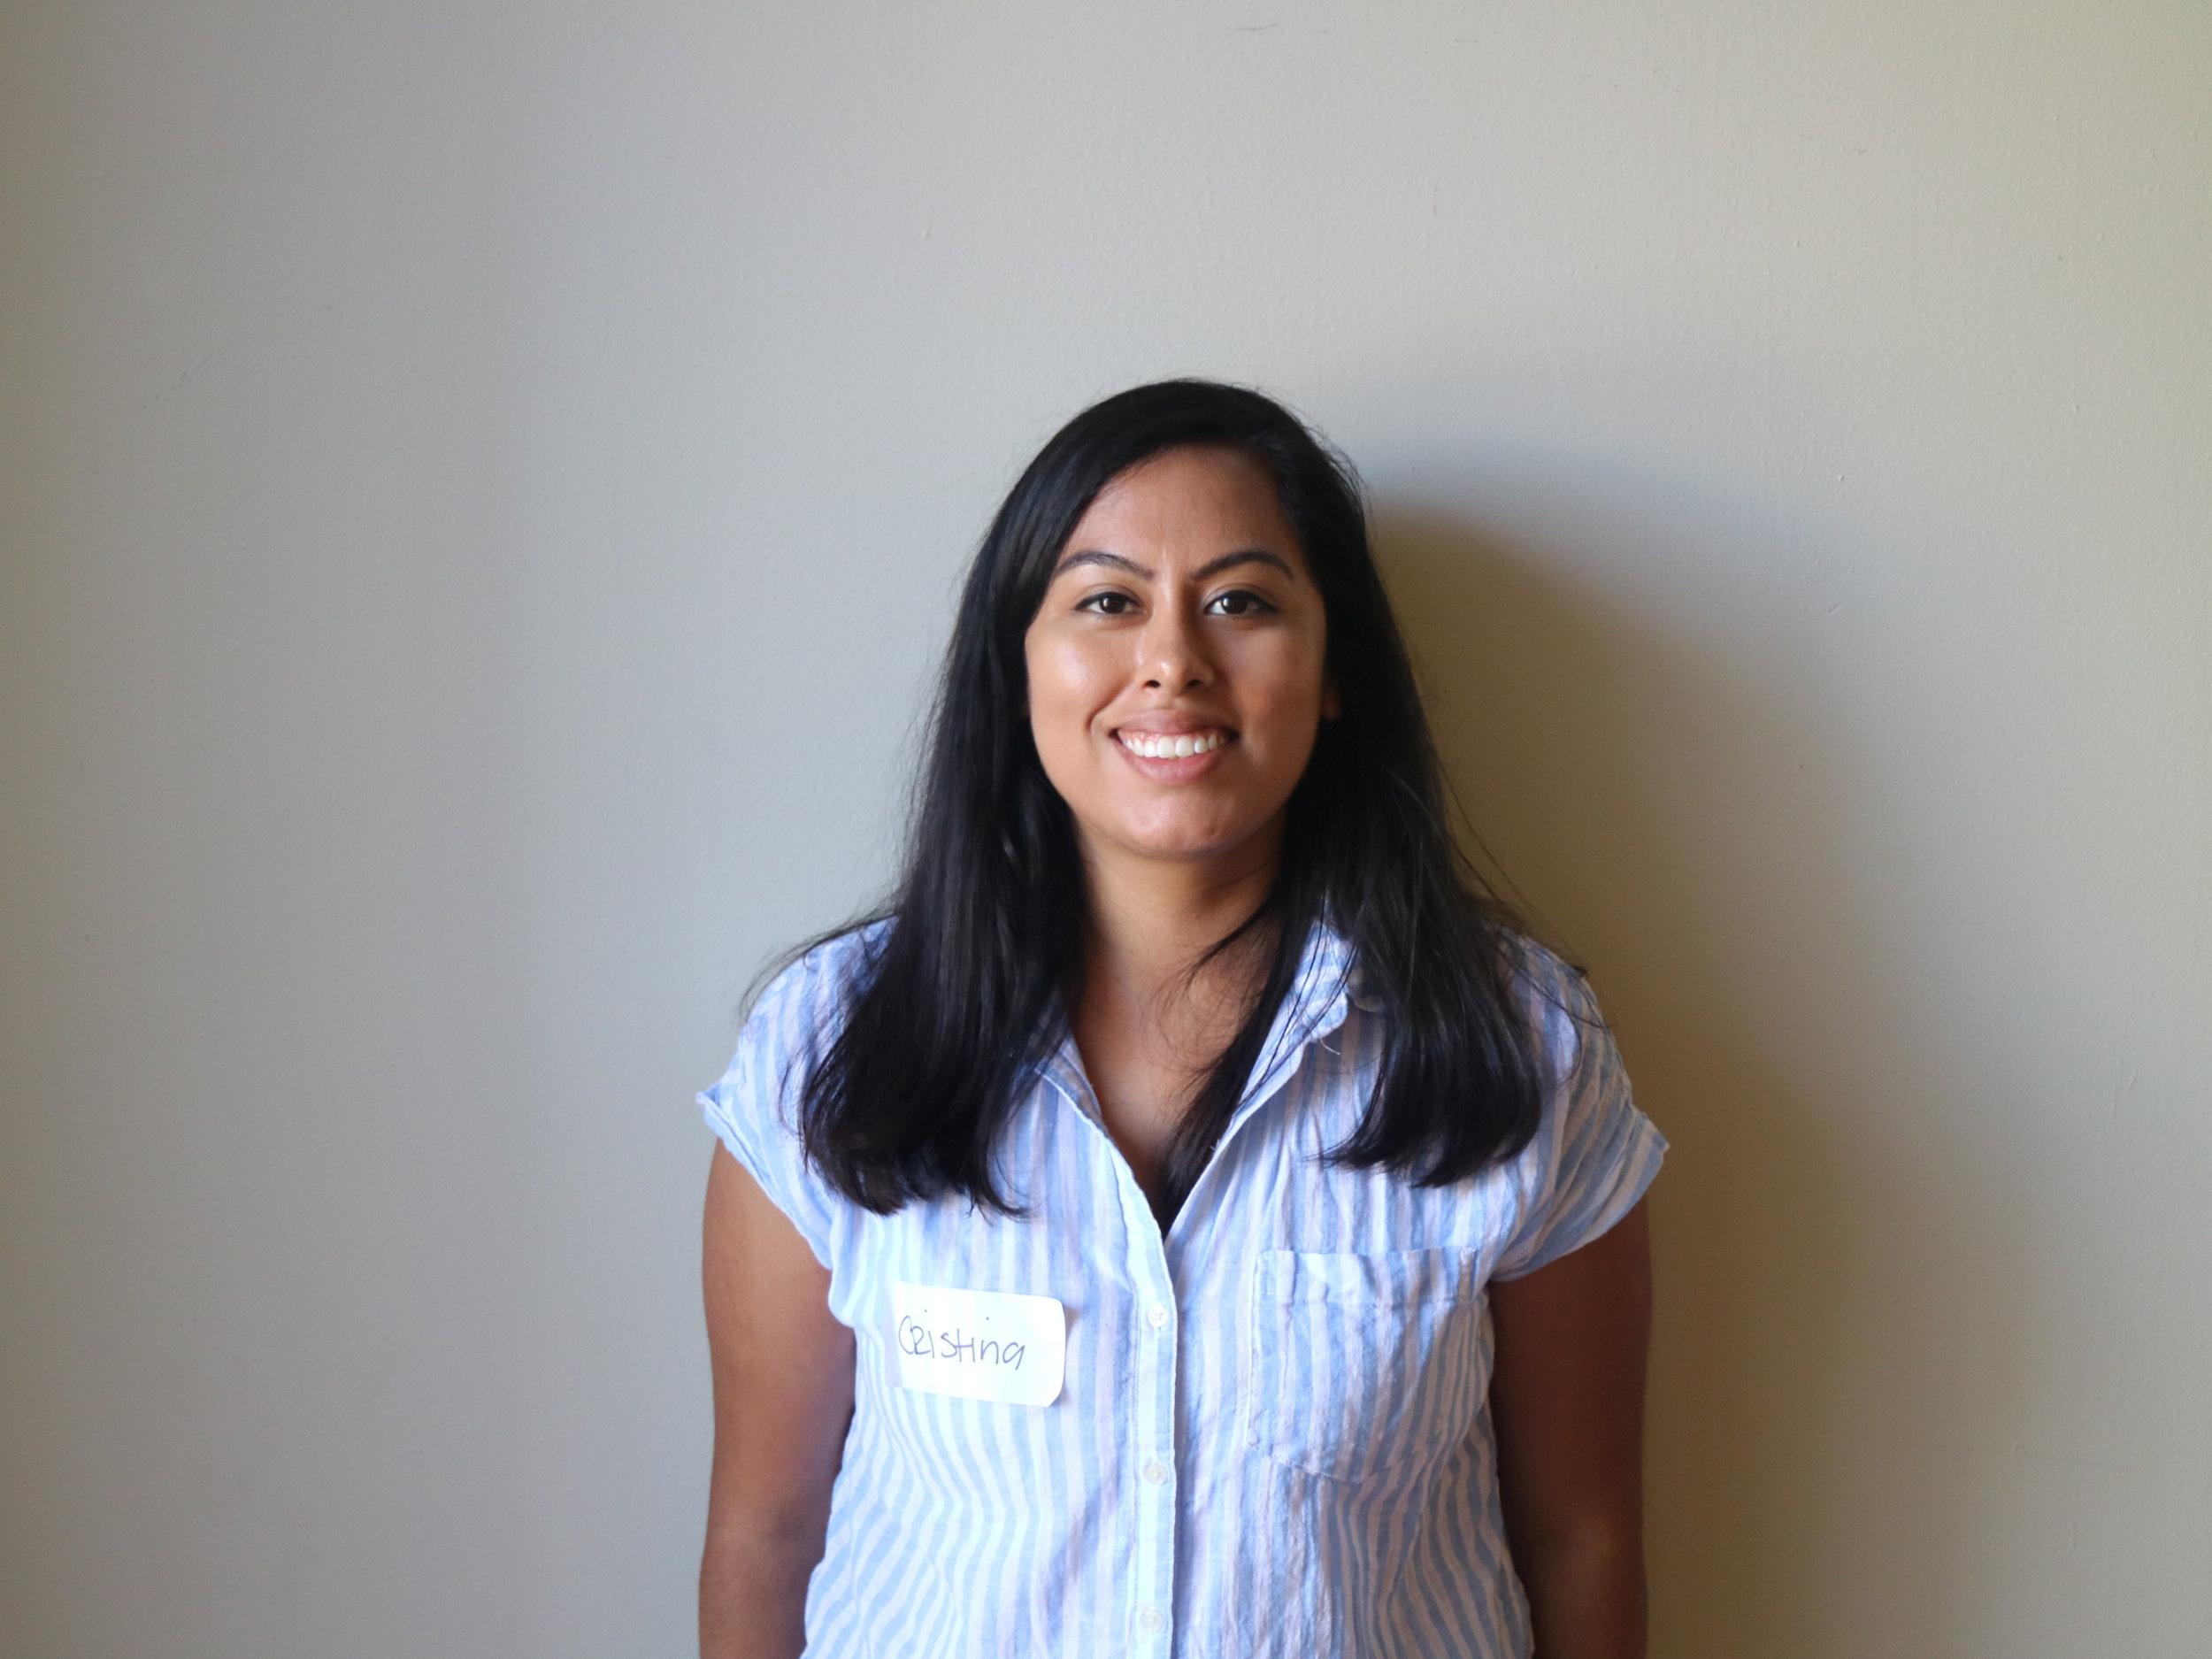 Cristina Franco